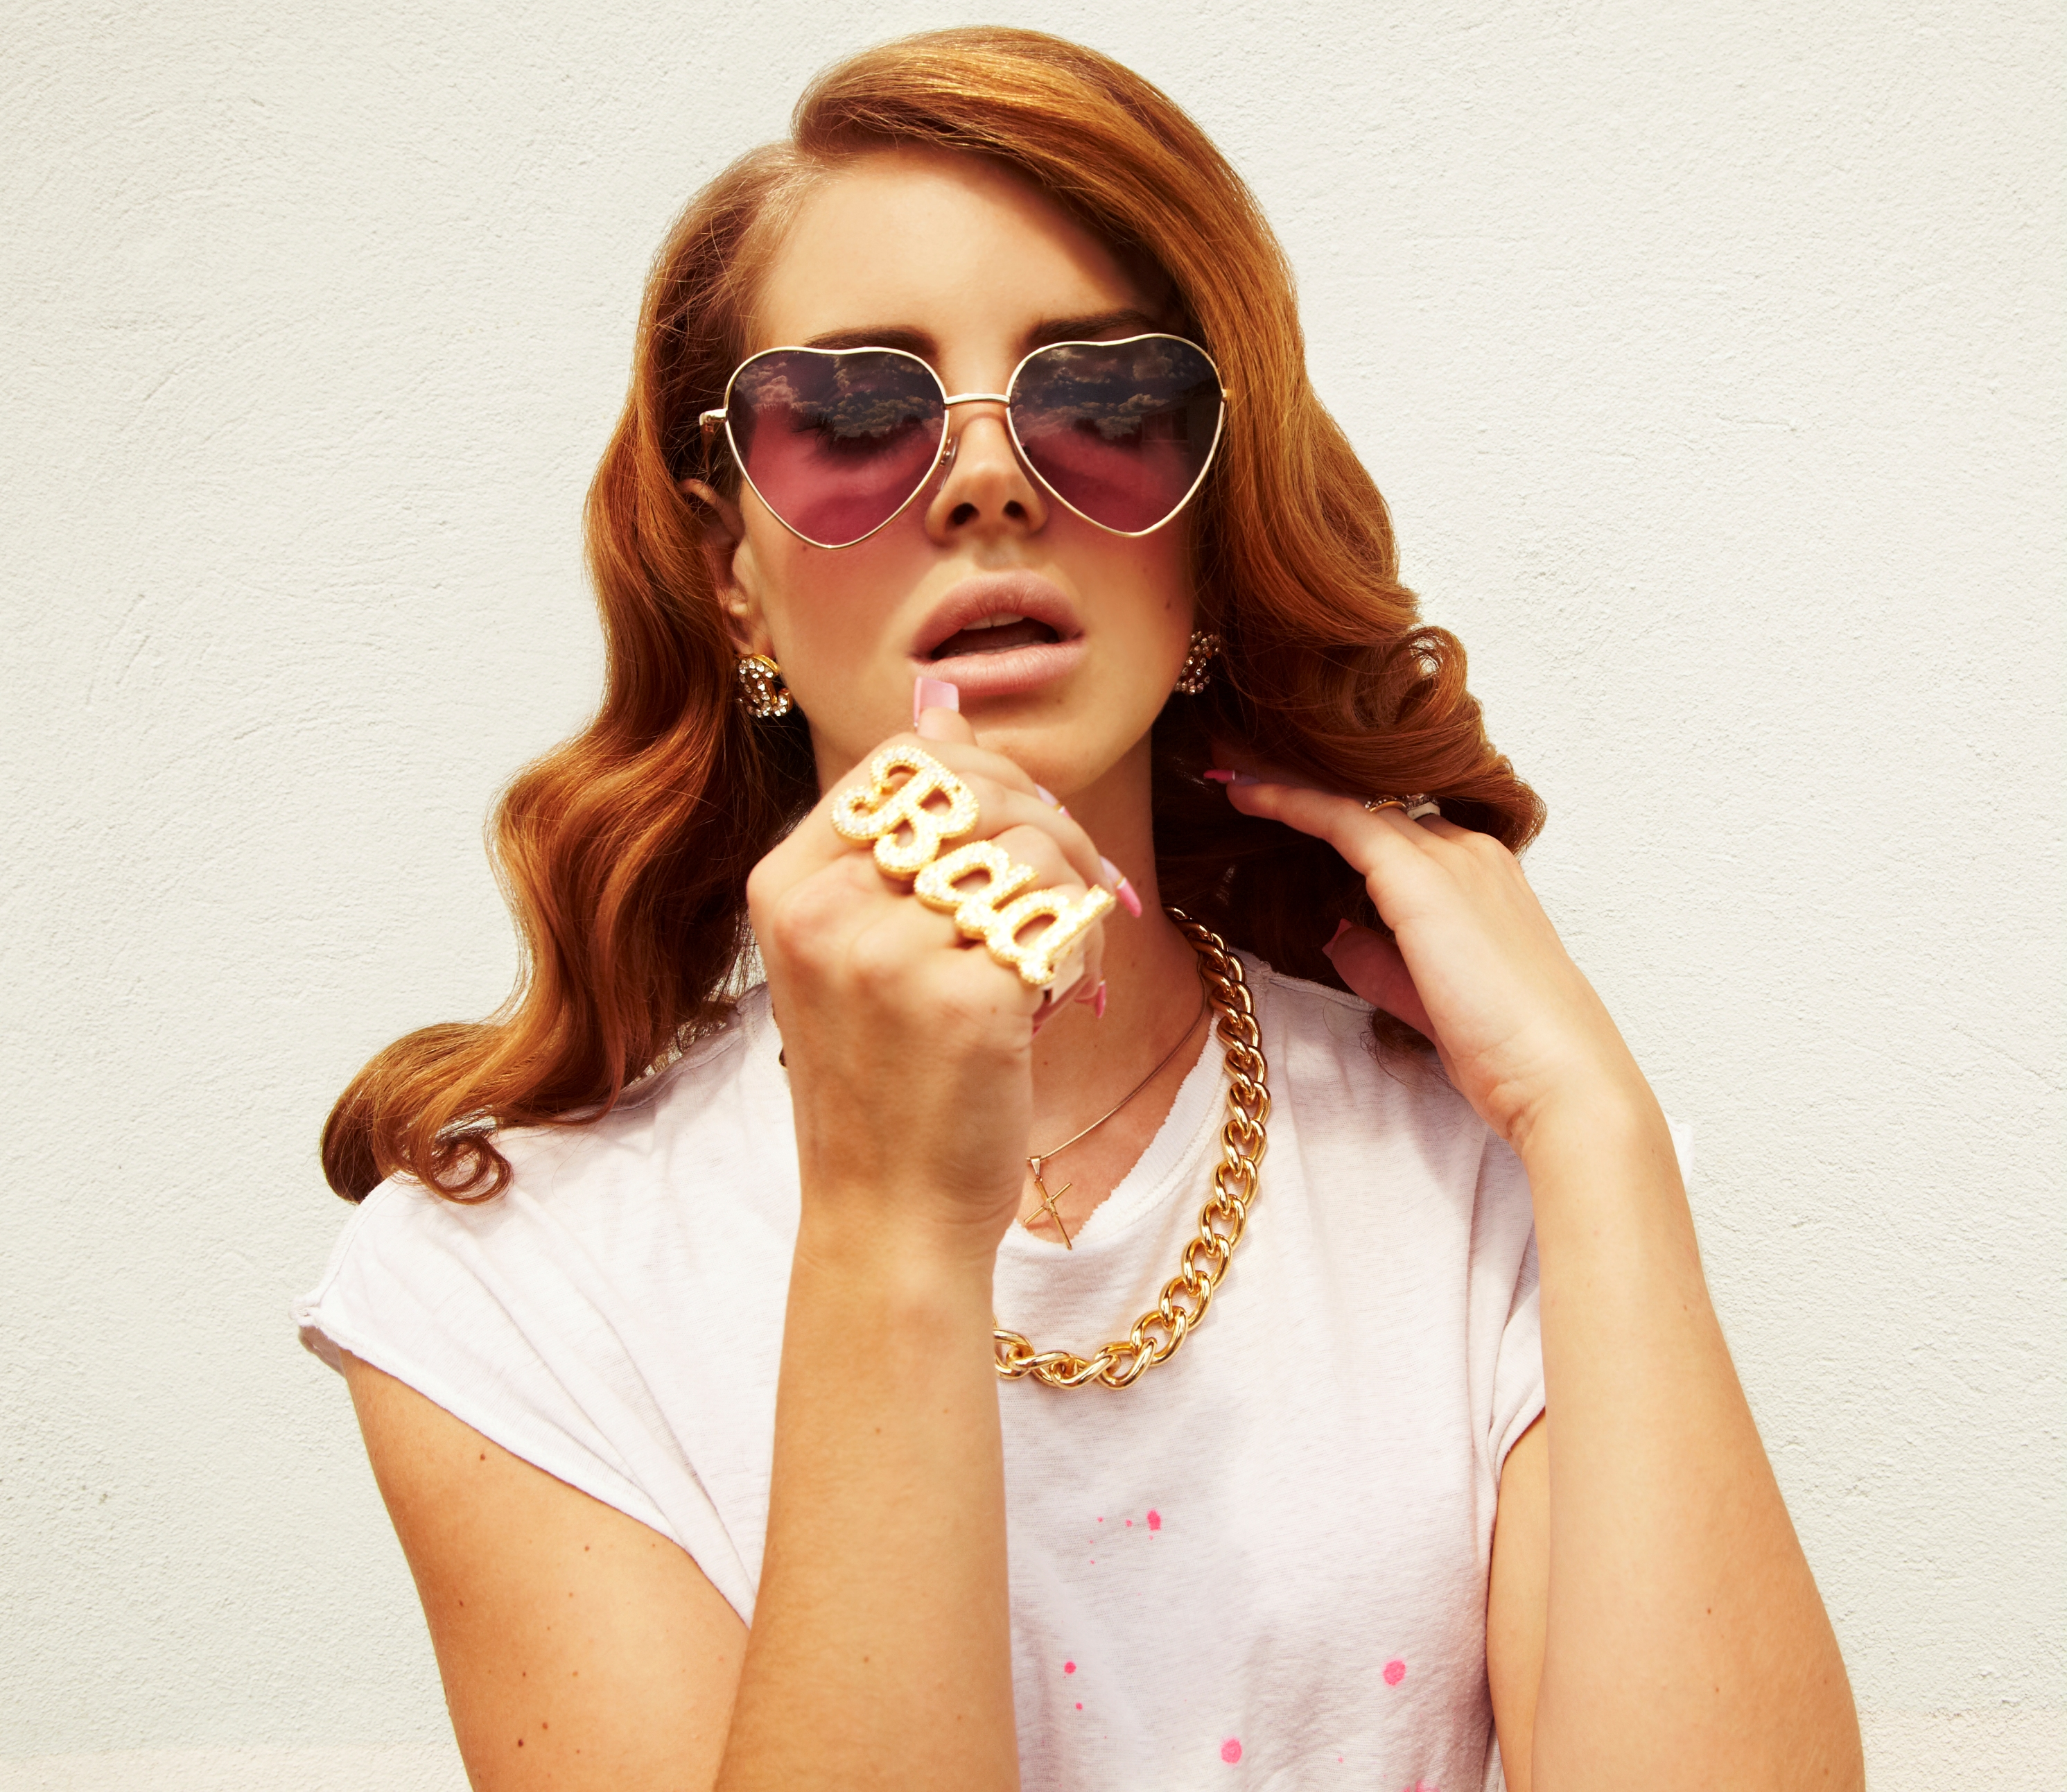 Nice Images Collection: Lana Del Rey Desktop Wallpapers